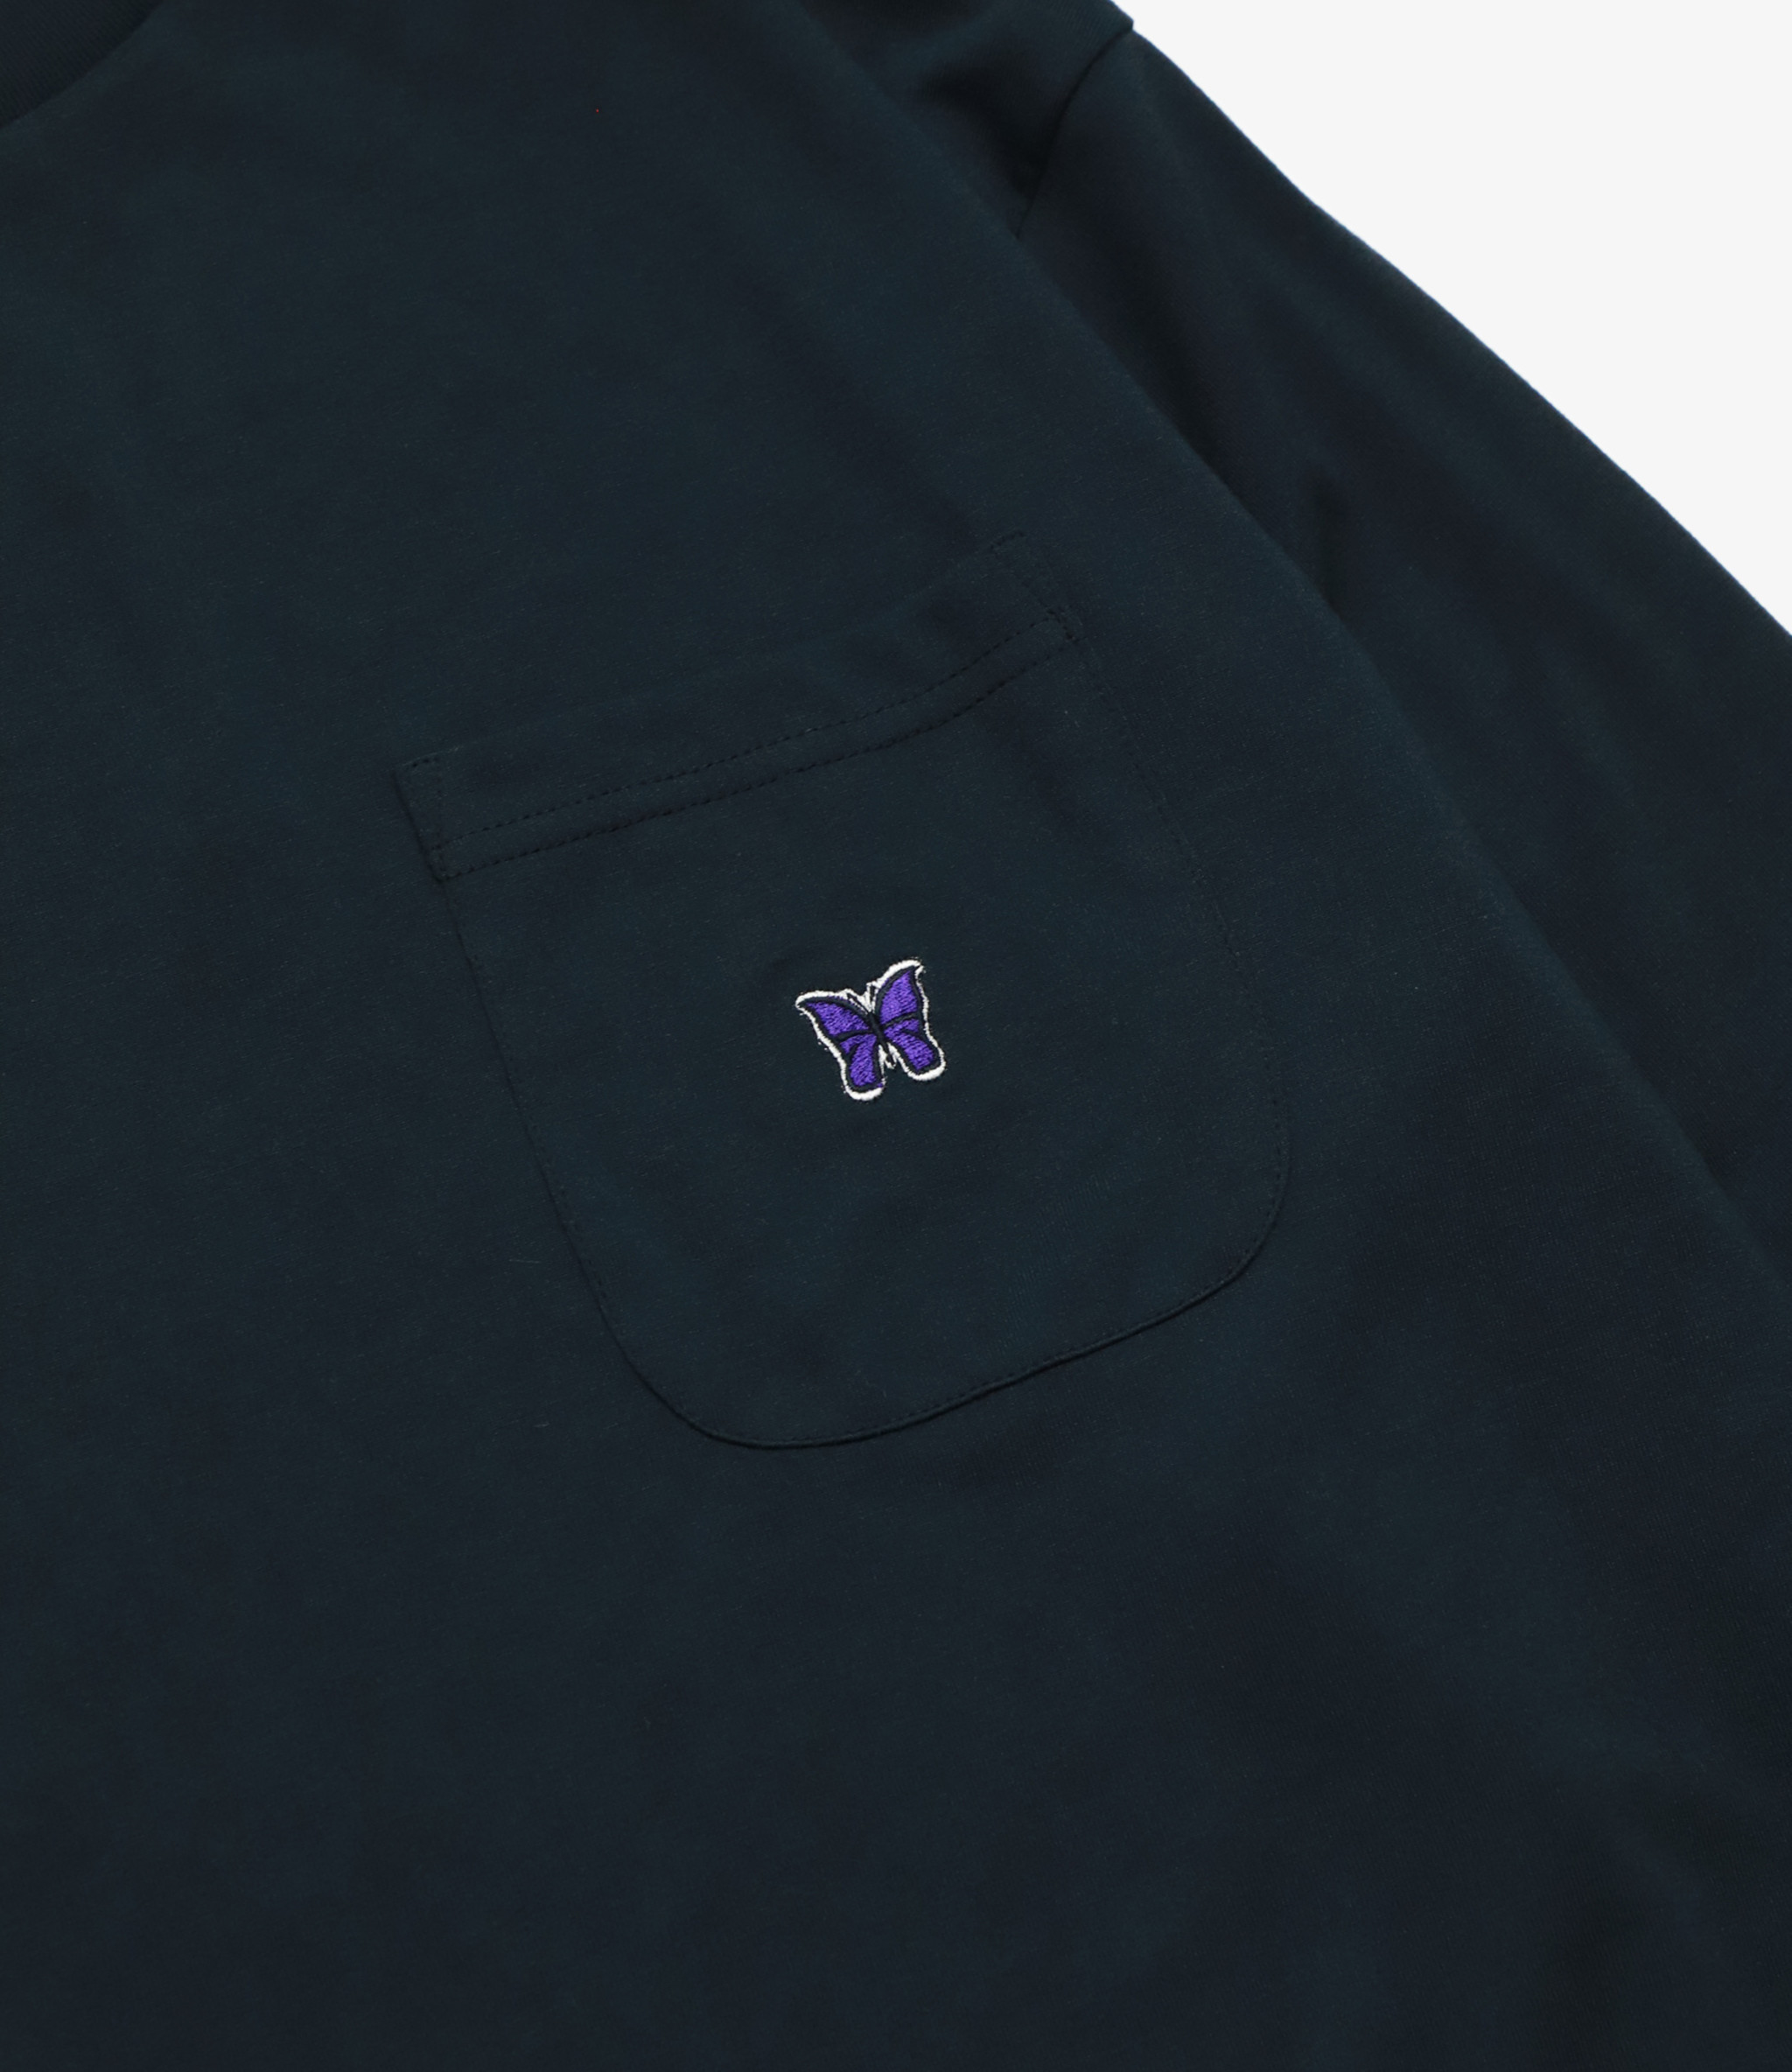 Needles L/S Crew Neck Tee - Synthetic Jersey - Black